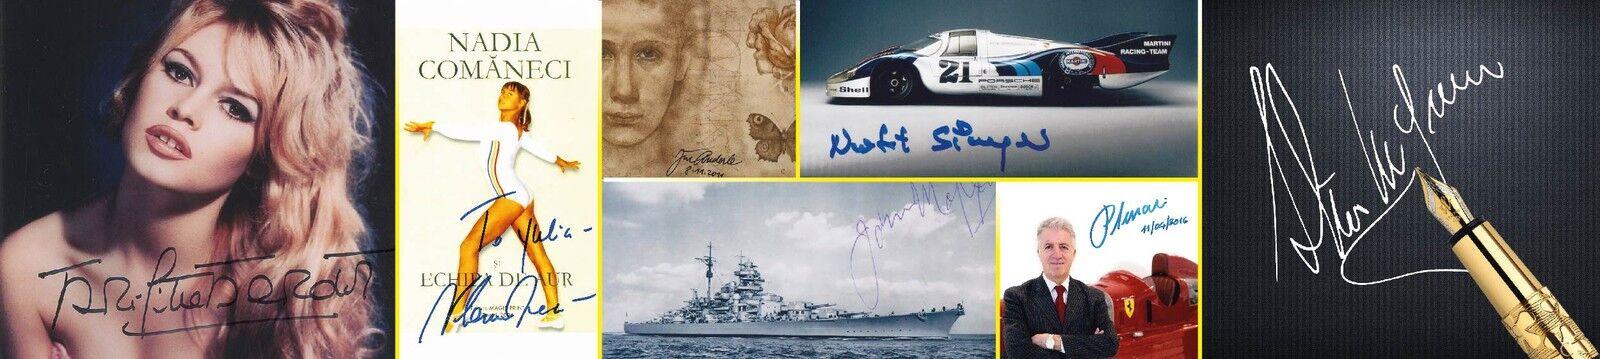 autogramy-podpisy.cz1